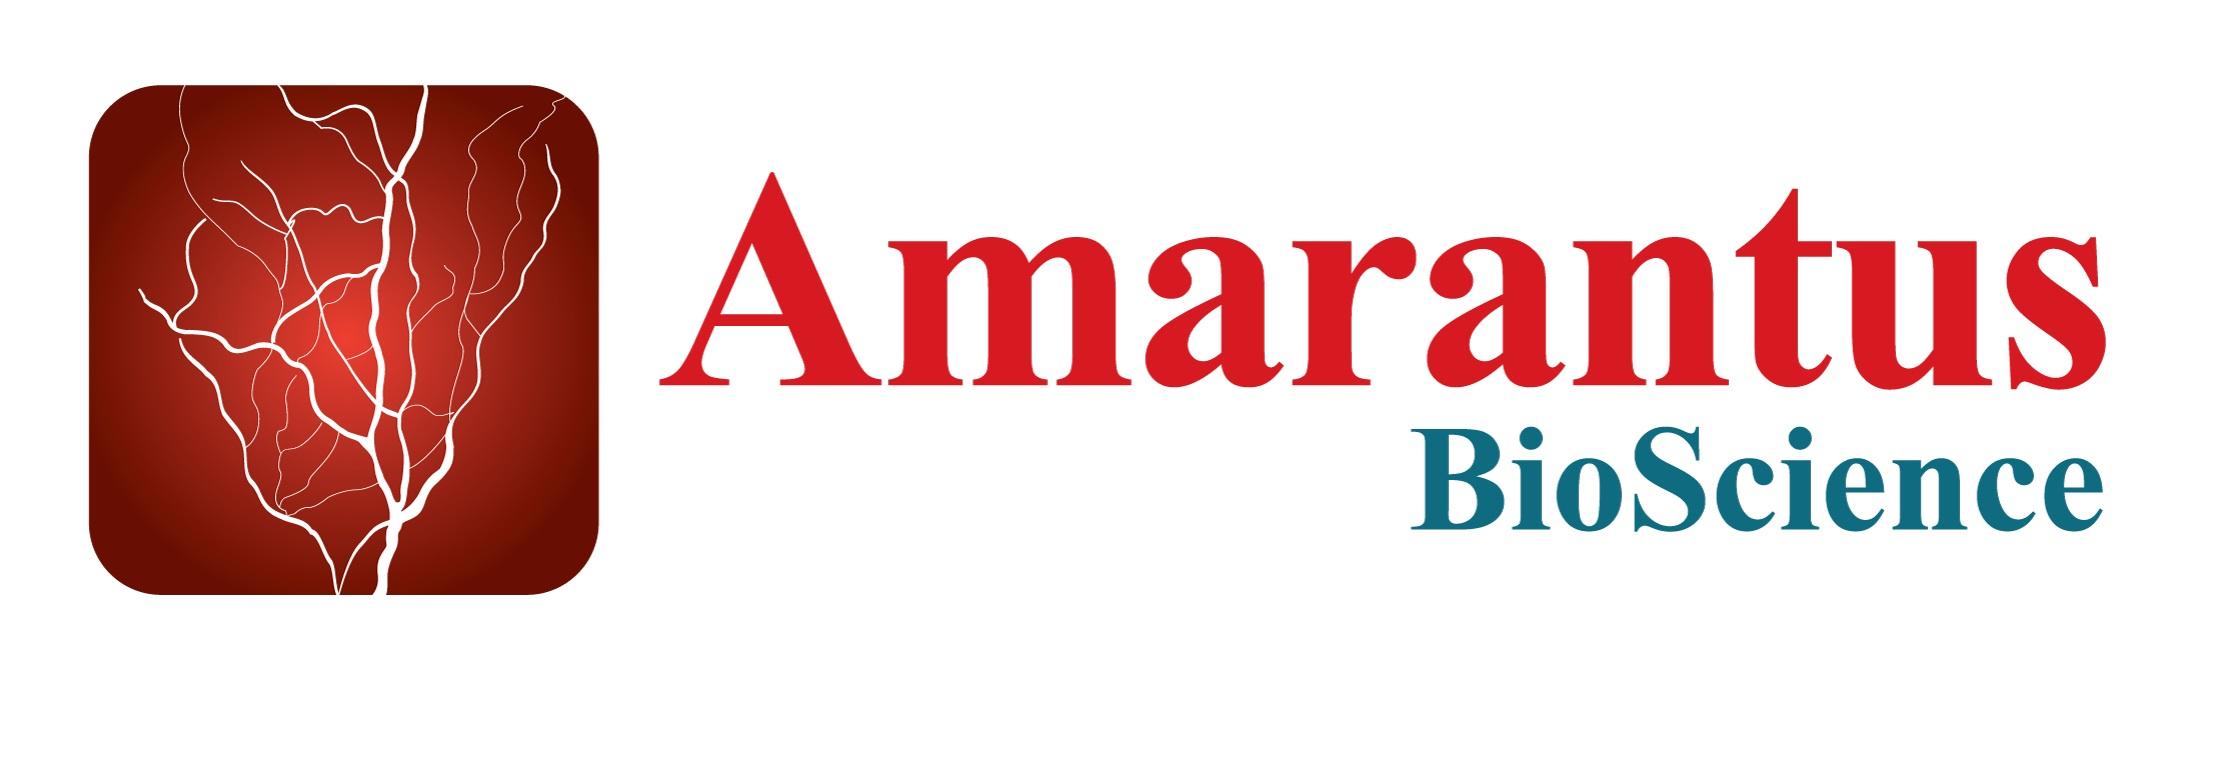 Amarantus BioScience Inc. (OTC:AMBS)